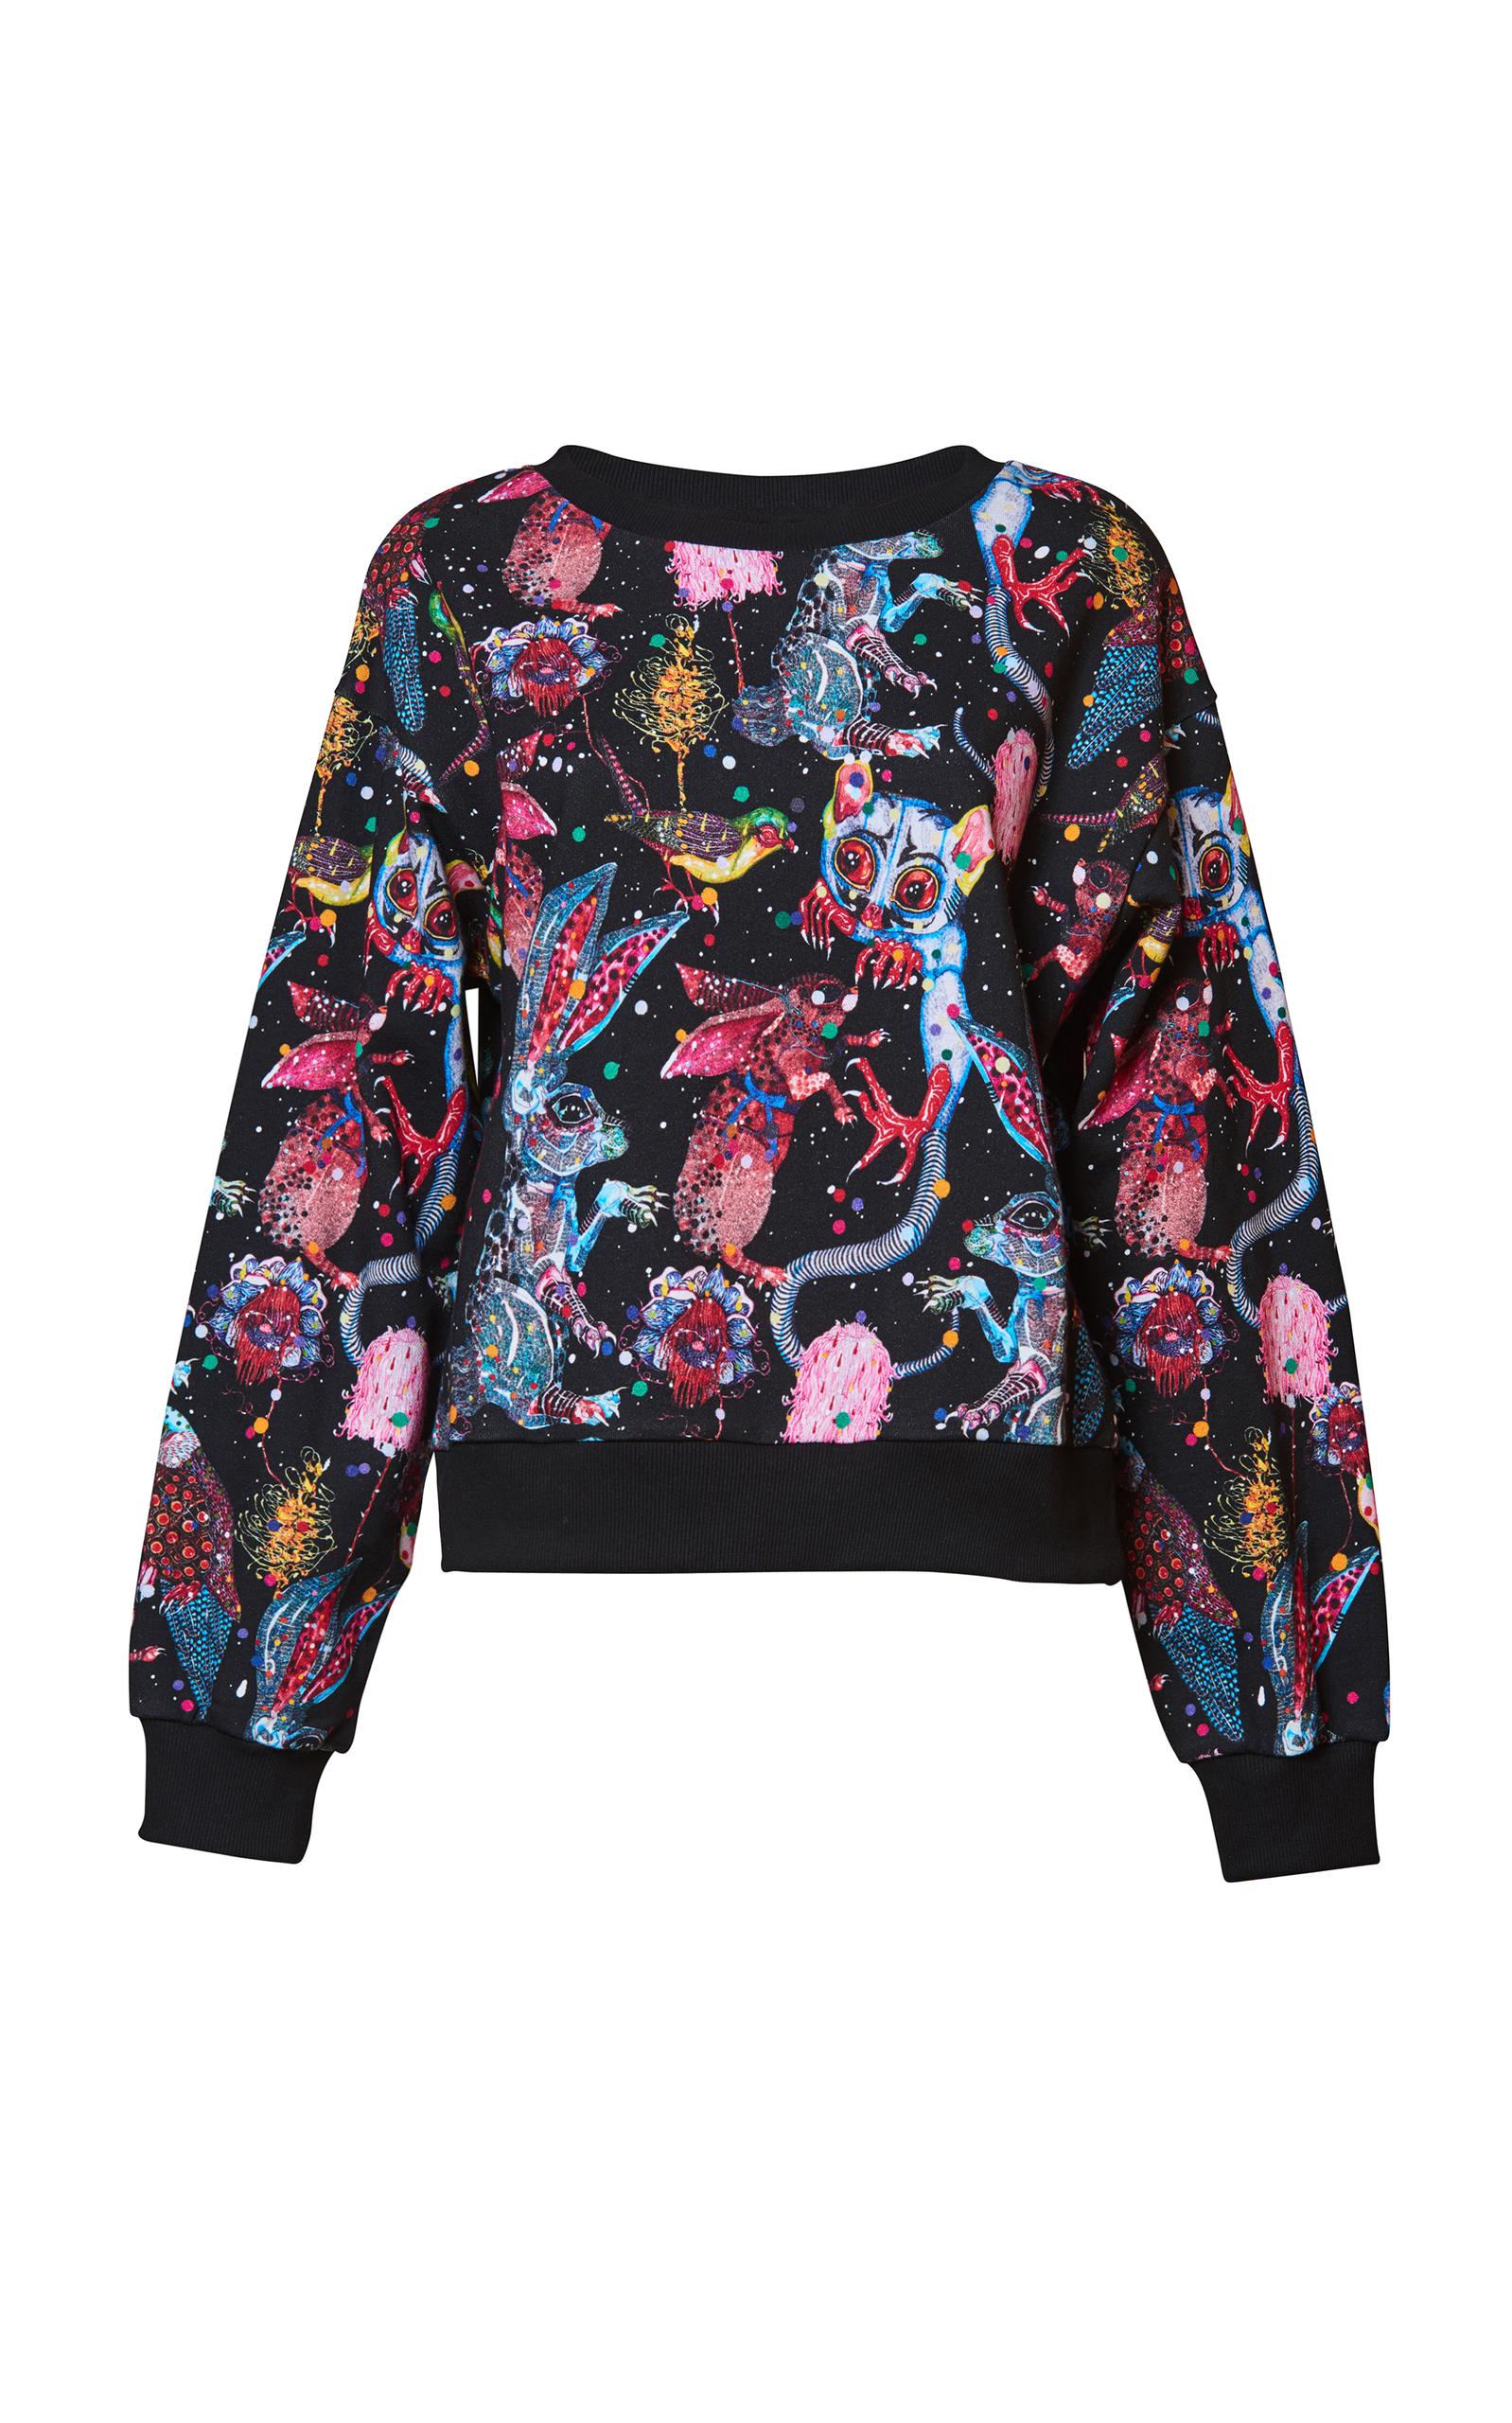 Romance Was Born animalia sweatshirt Enjoy Sale Online Discount Geniue Stockist cUMkh